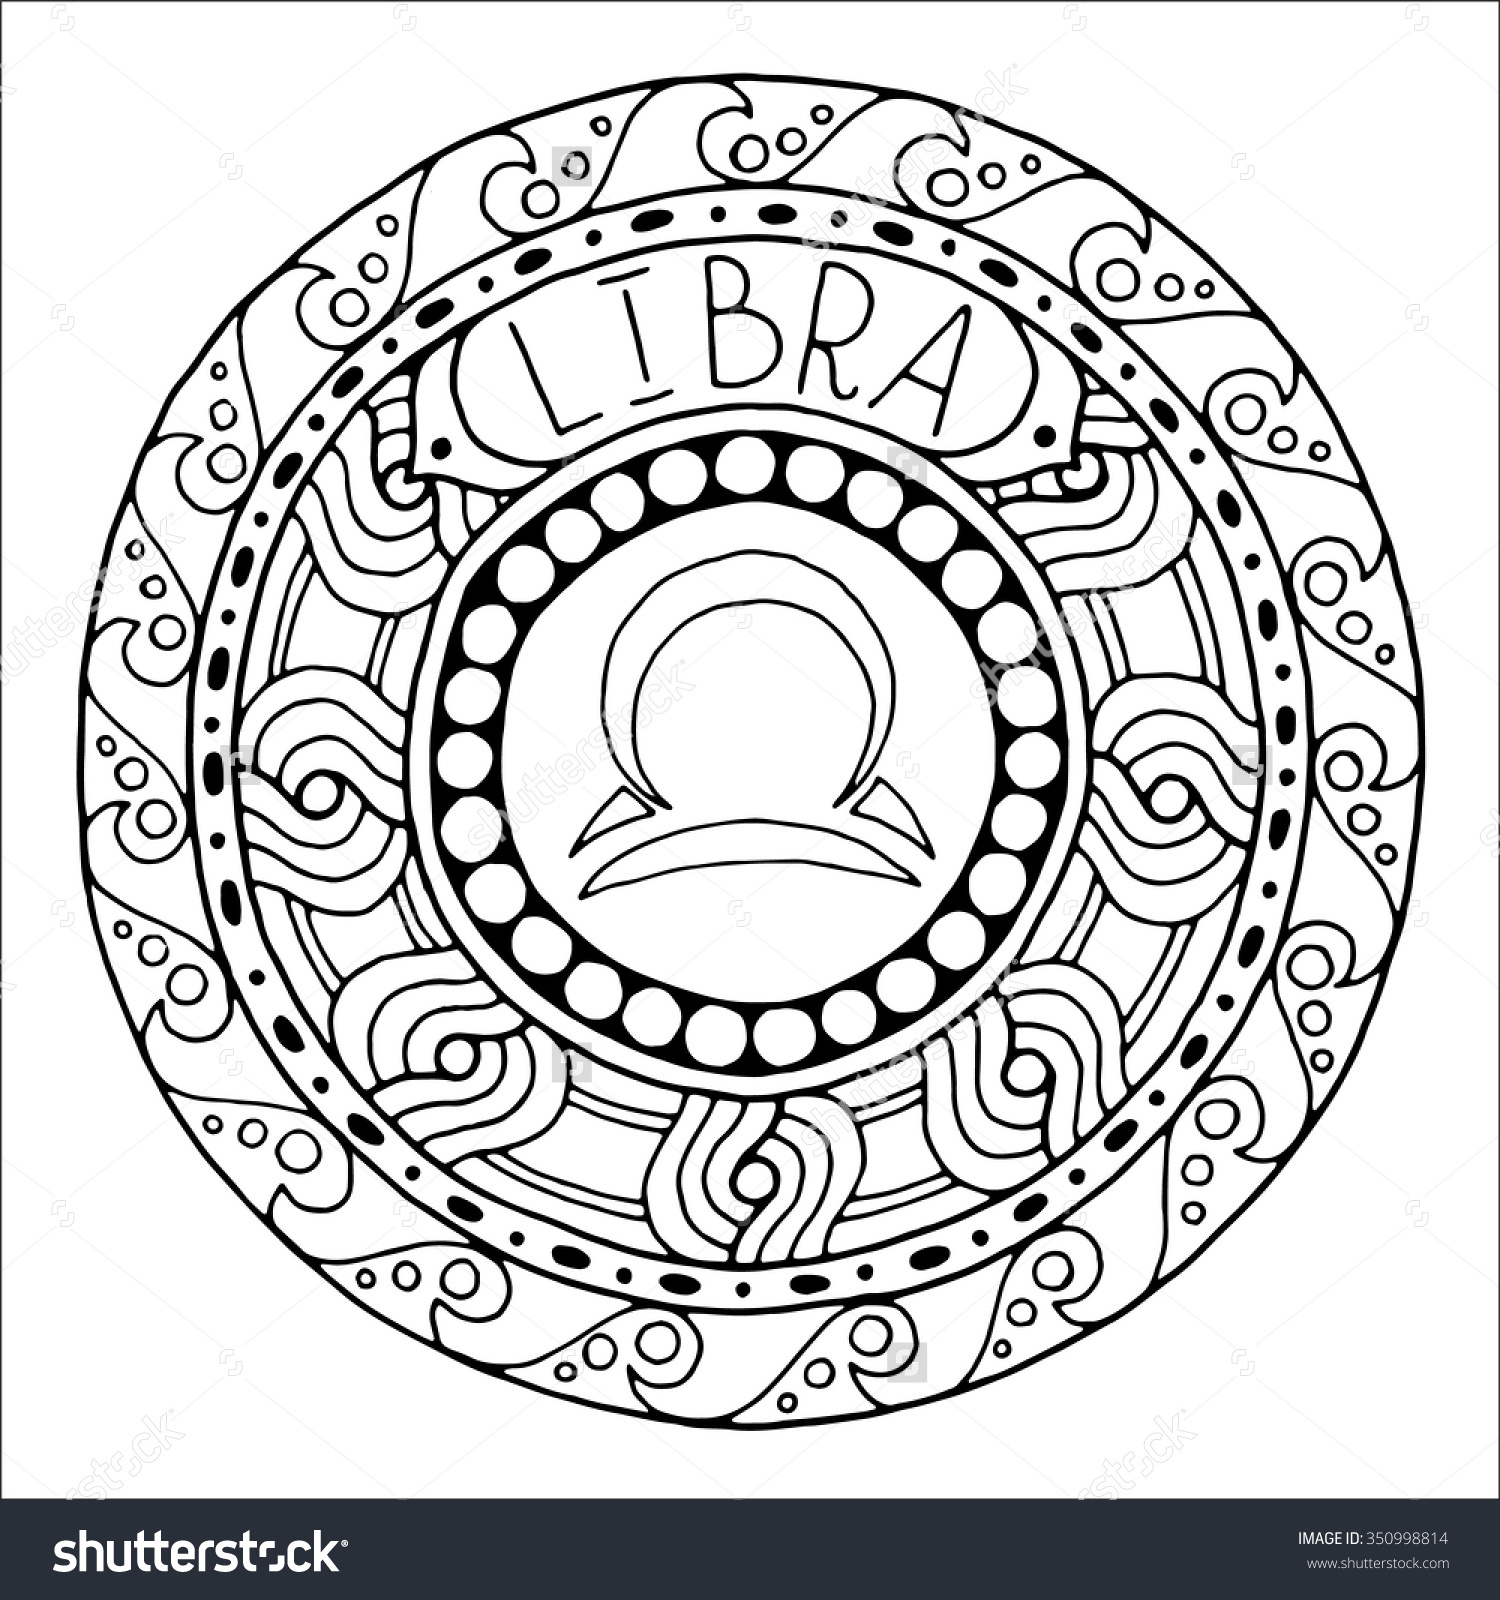 1500x1600 Zodiac Sign Of Libra Shutterstock Coloring